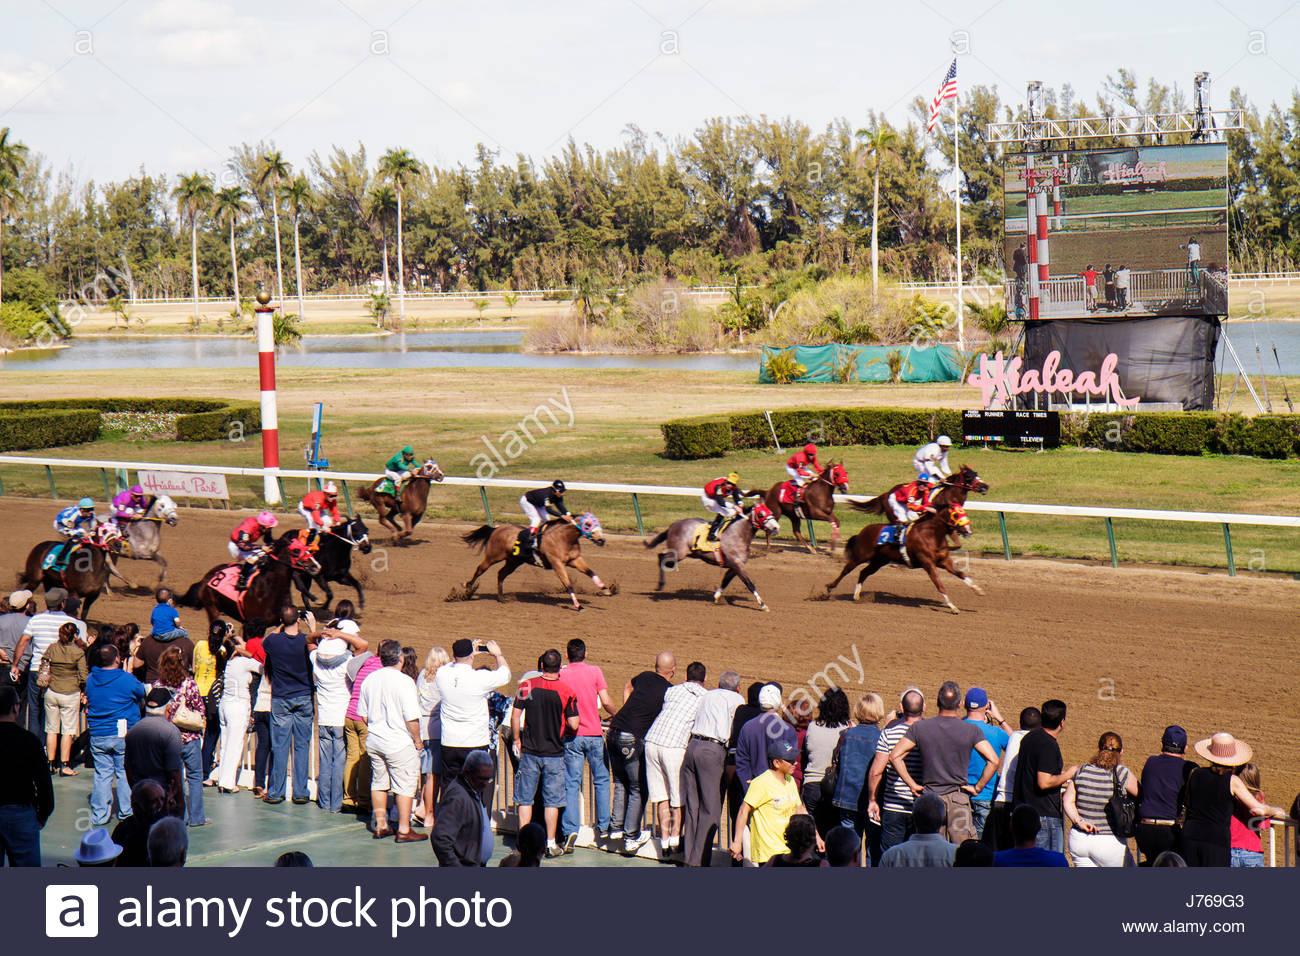 HialeahMiami Florida Hialeah Park quarter horse racing racetrack finish line crowd bettors Stock Photo